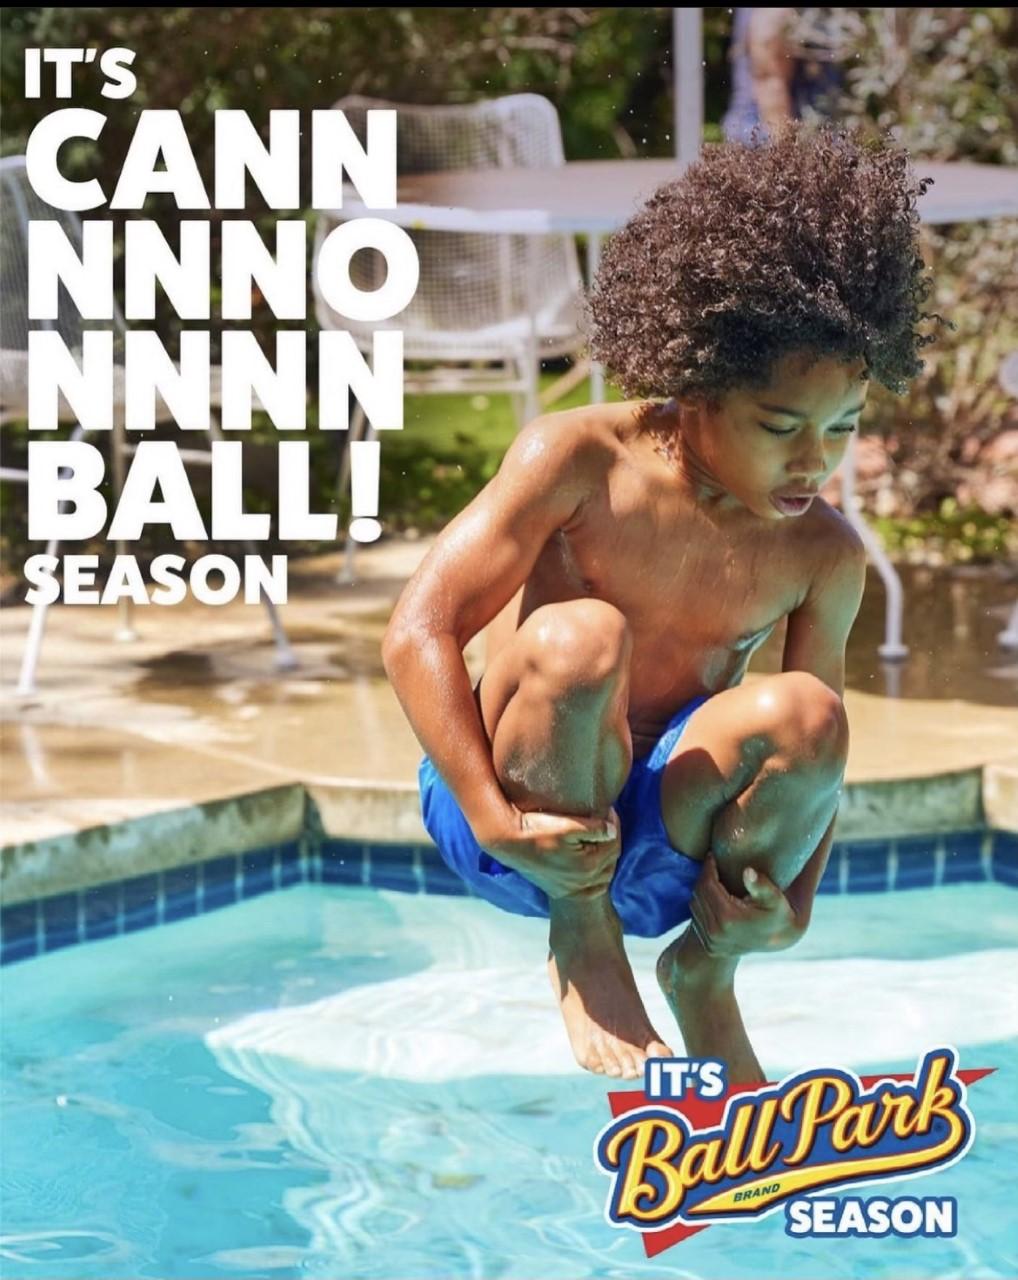 Carter Morgan Cannonballs for Ballpark Franks